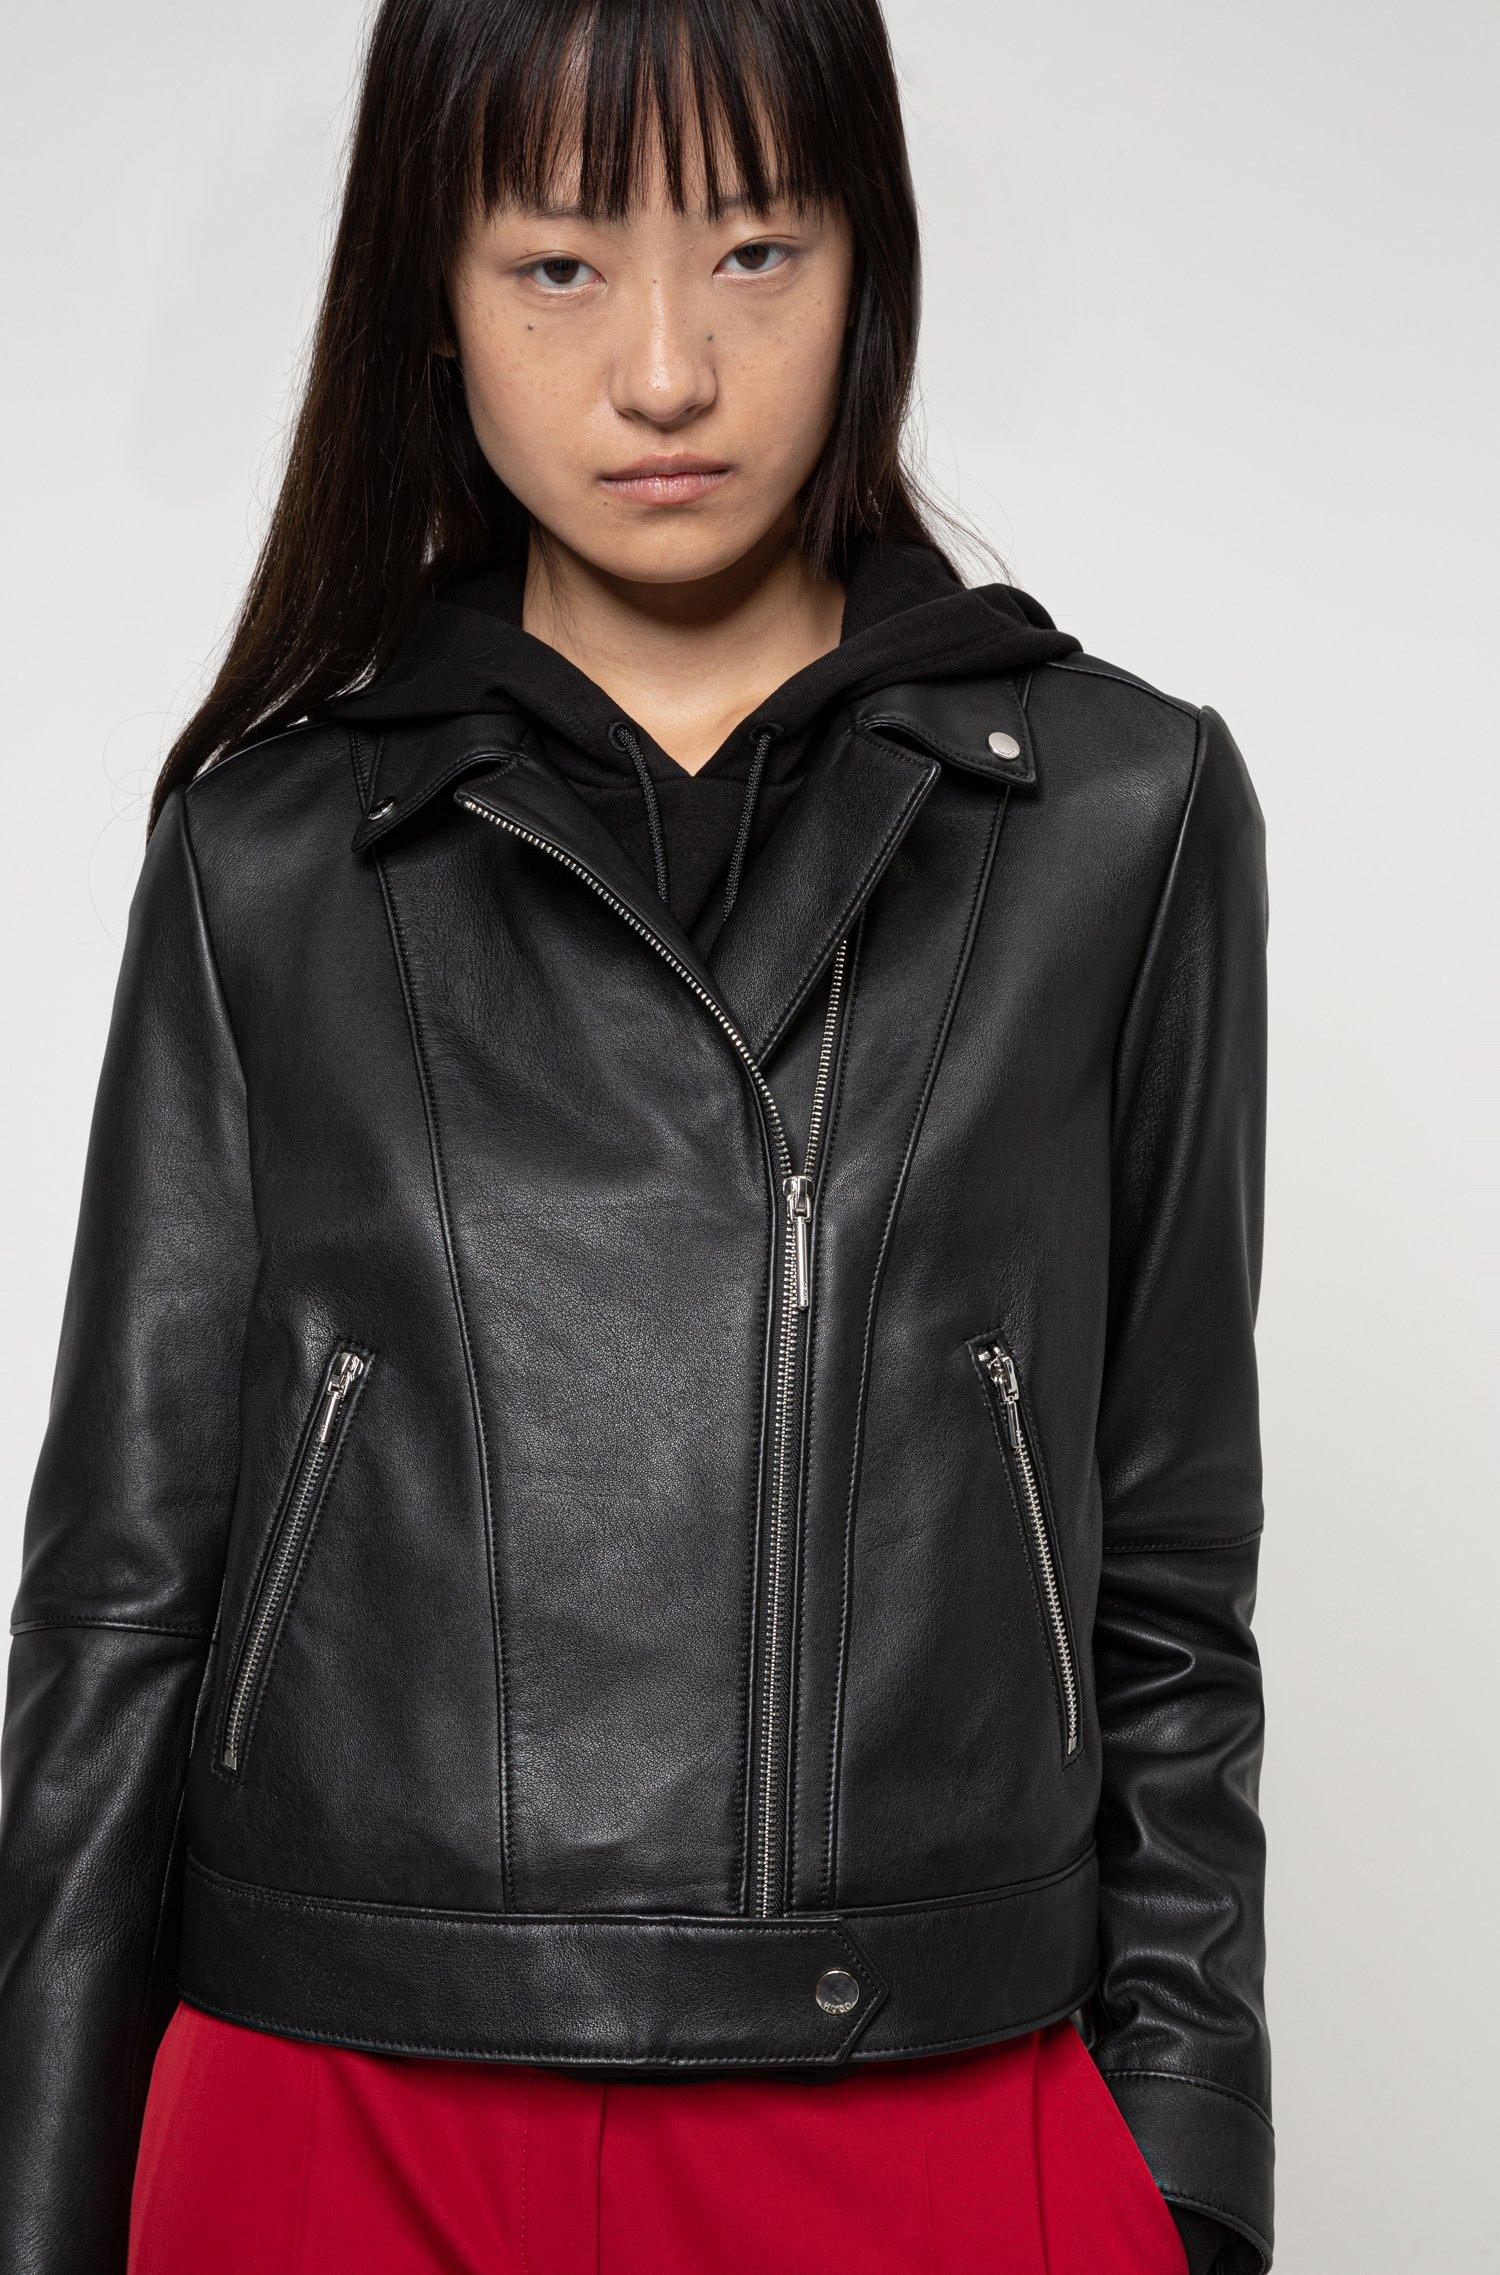 Regular-fit biker jacket in leather with rear slogan, Patterned